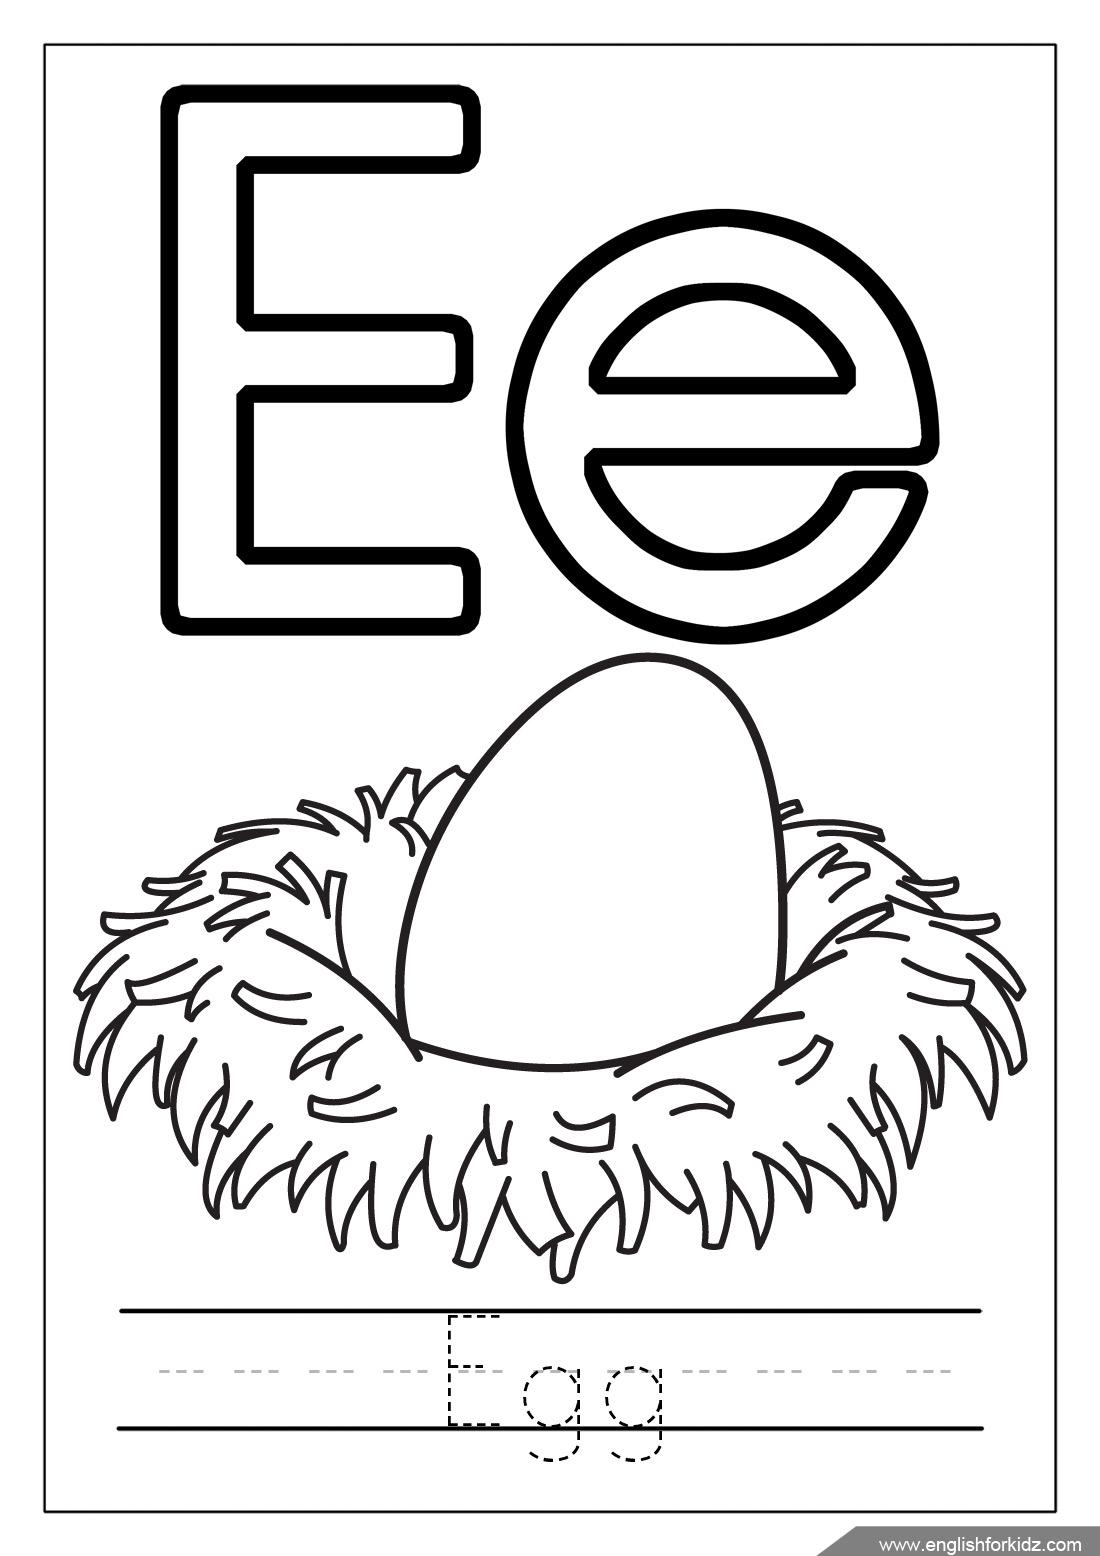 Printable Alphabet Coloring Pages (Letters A - J)